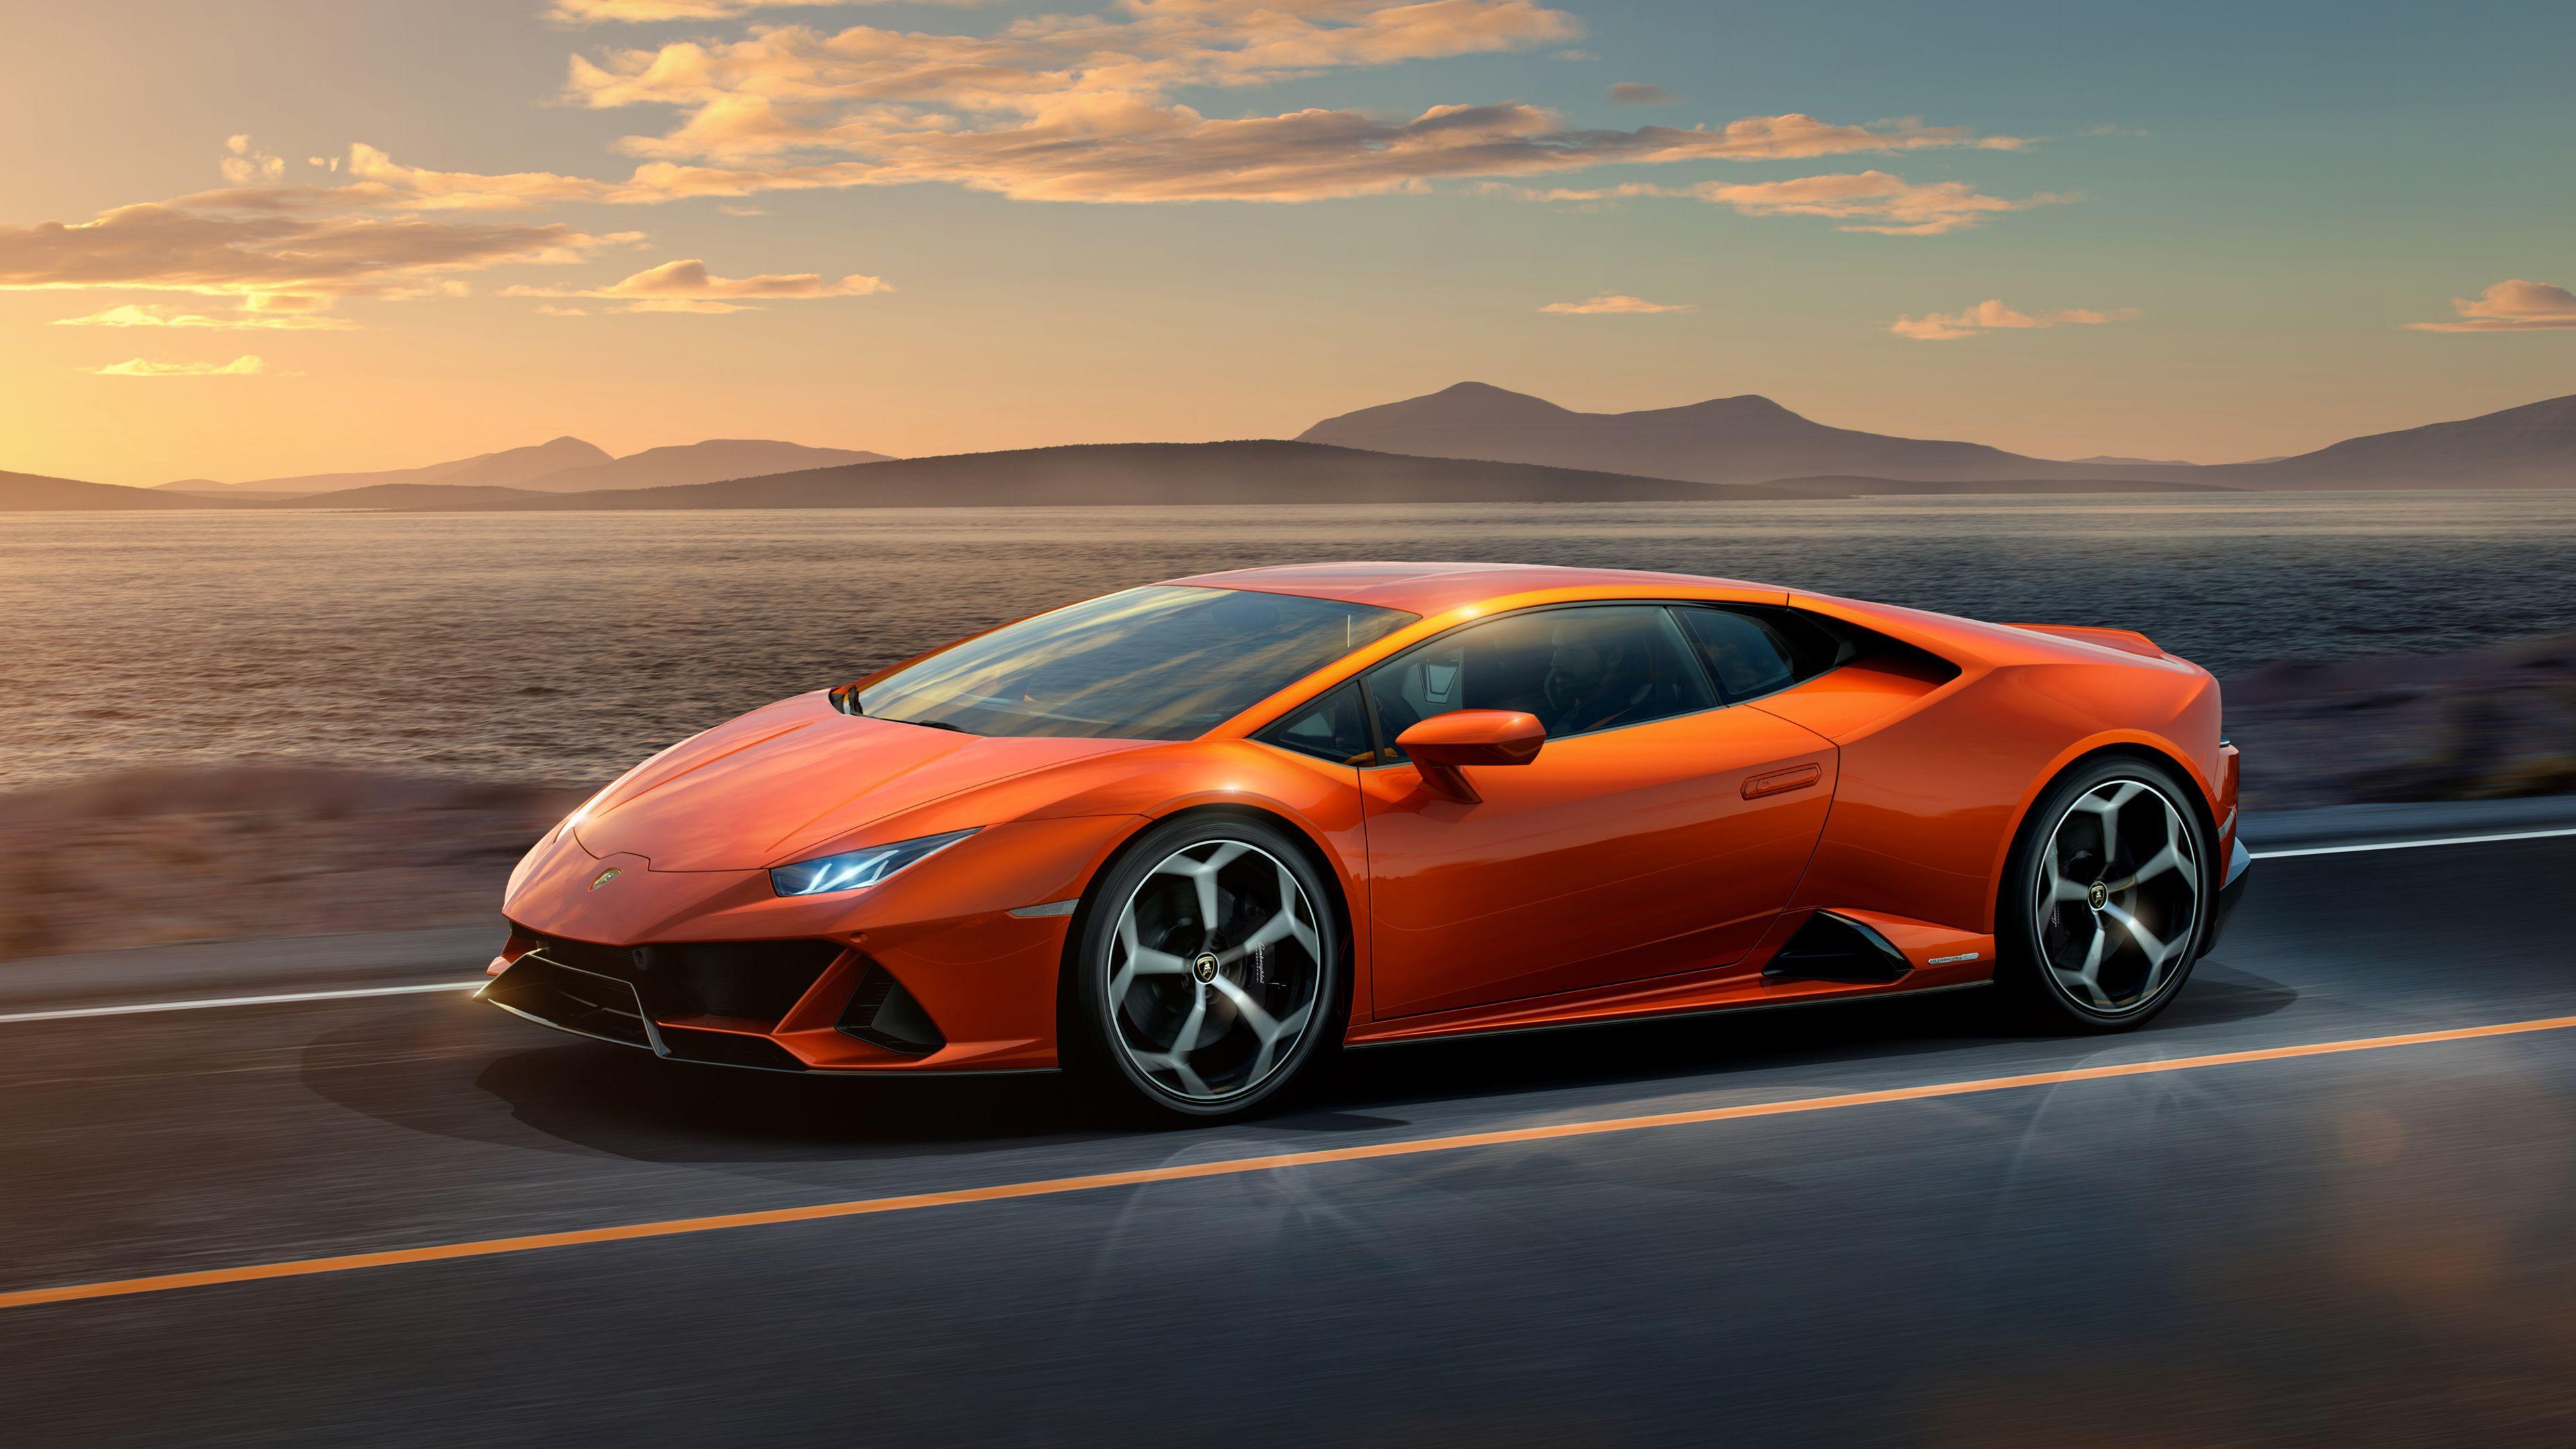 Lamborghini 4k Wallpapers Top Free Lamborghini 4k